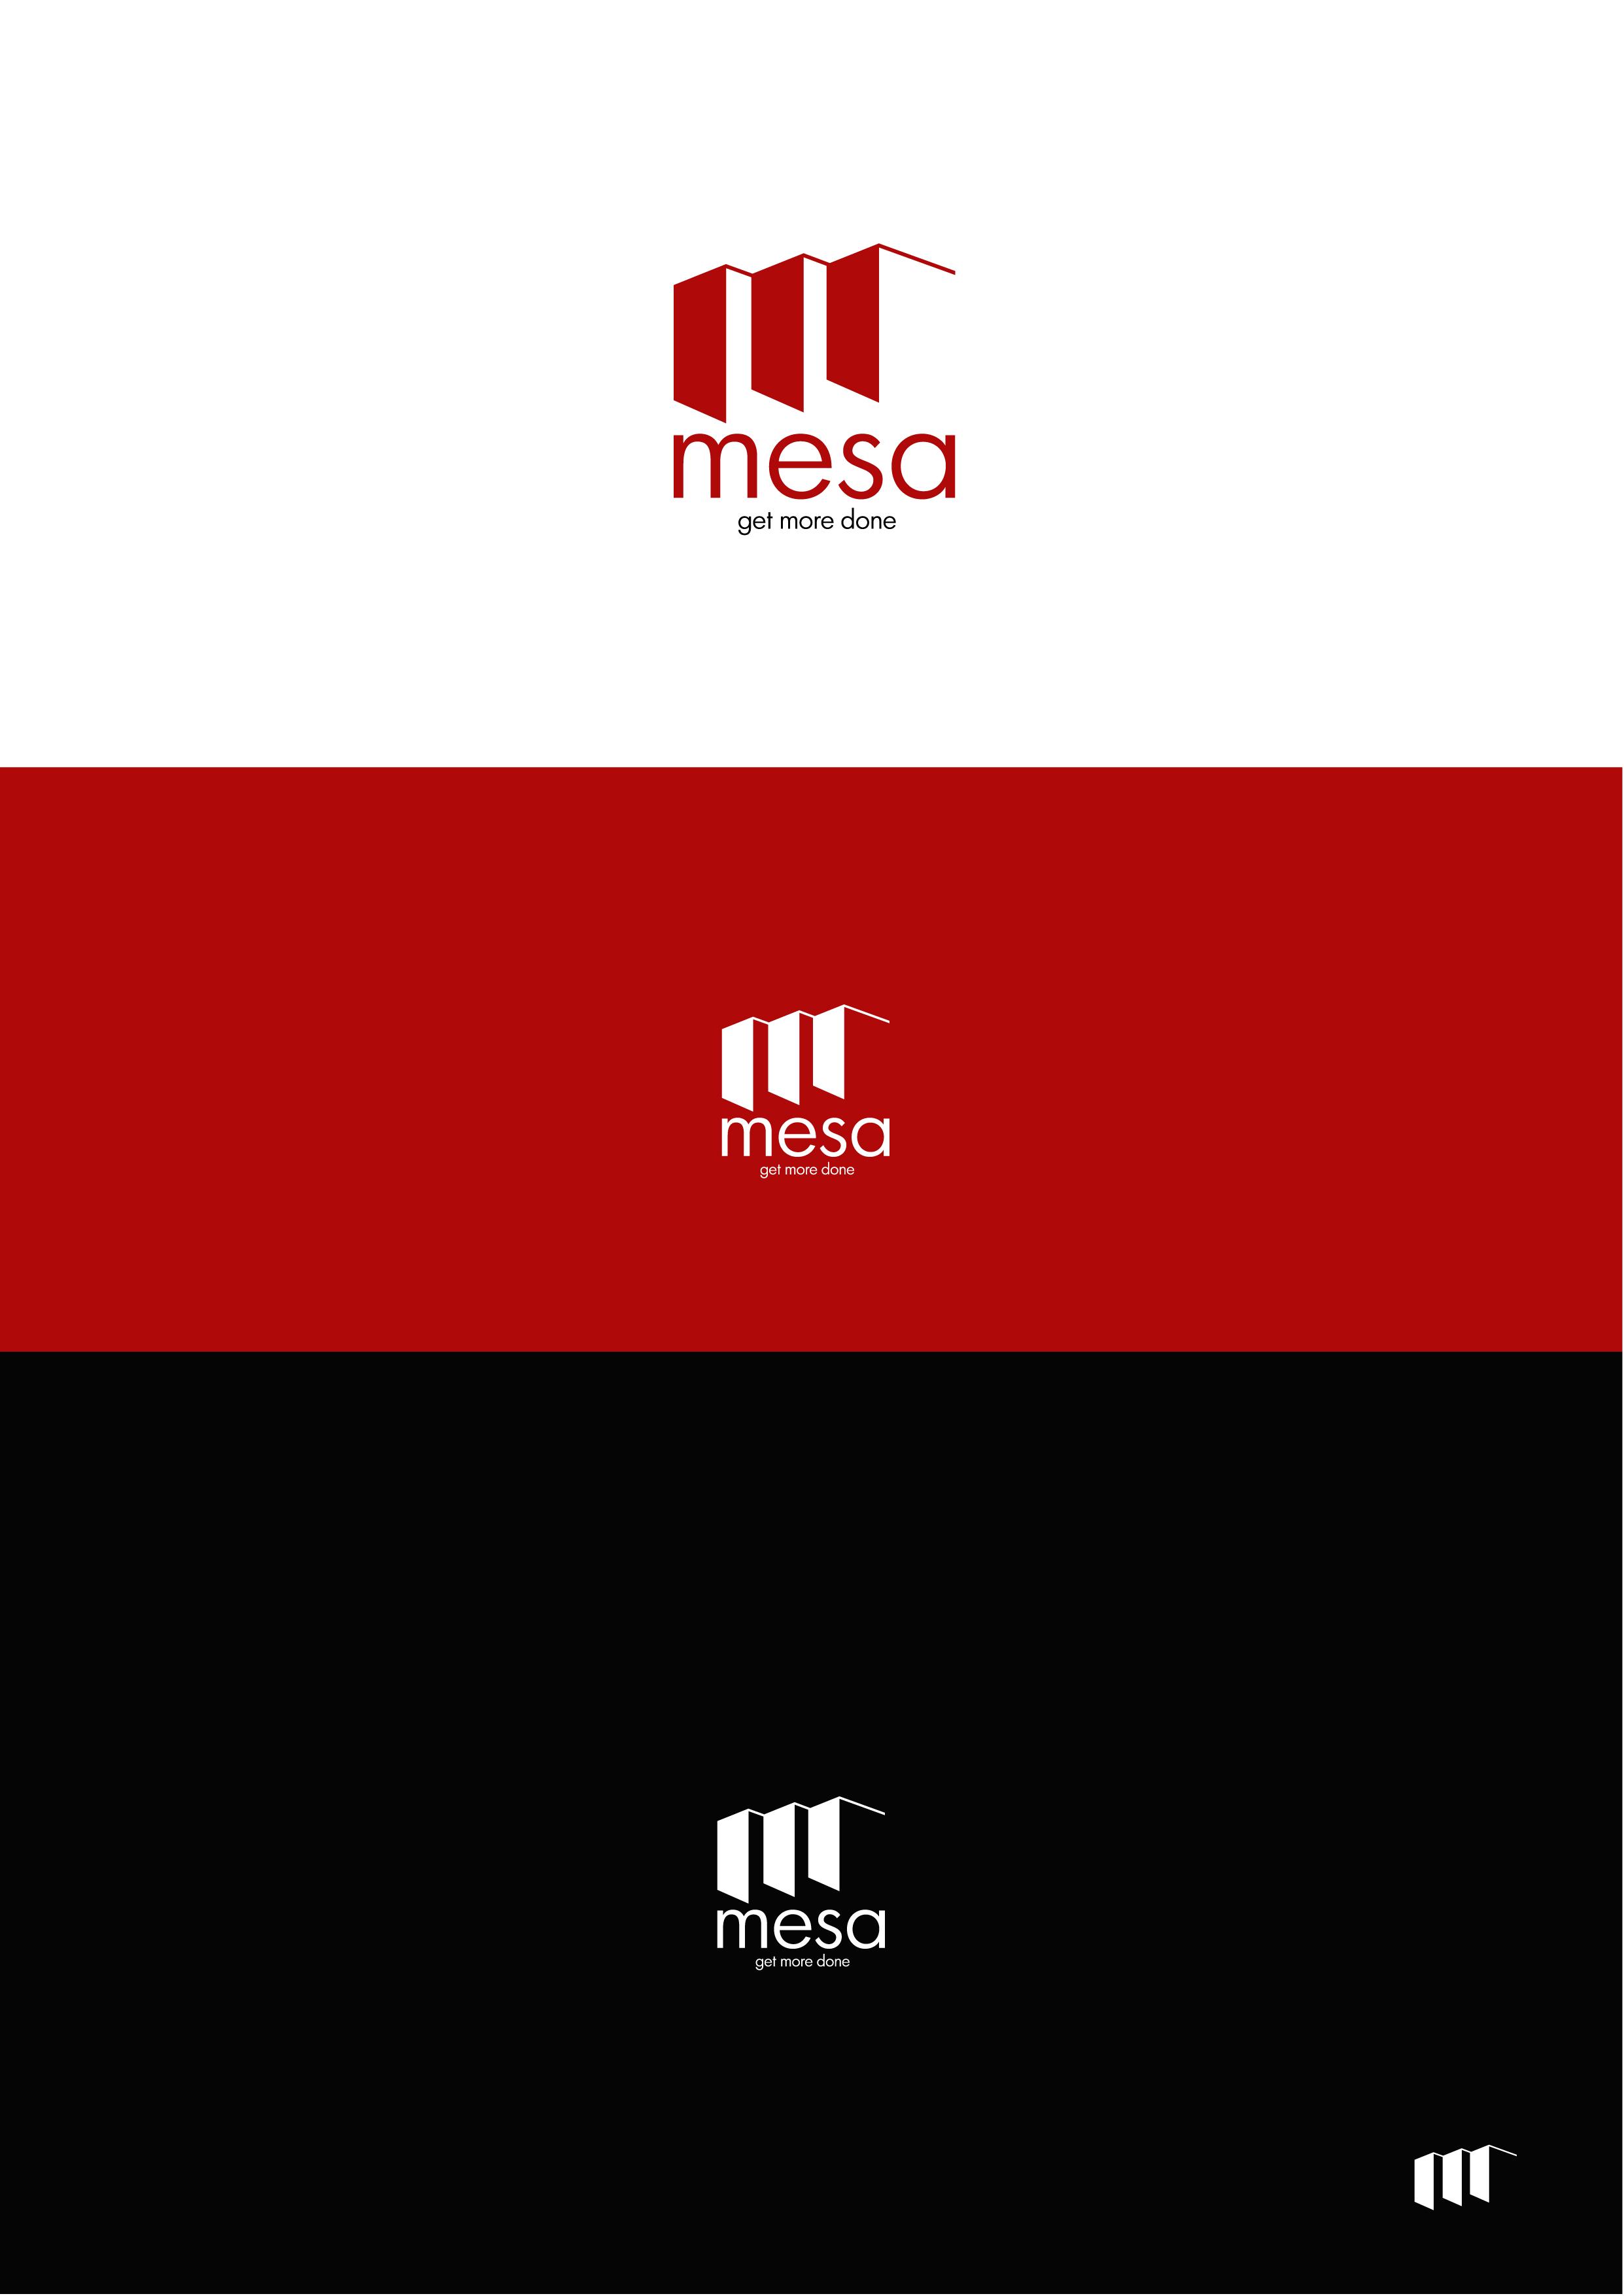 Logo Design by Osi Indra - Entry No. 56 in the Logo Design Contest Logo Design for Mesa.